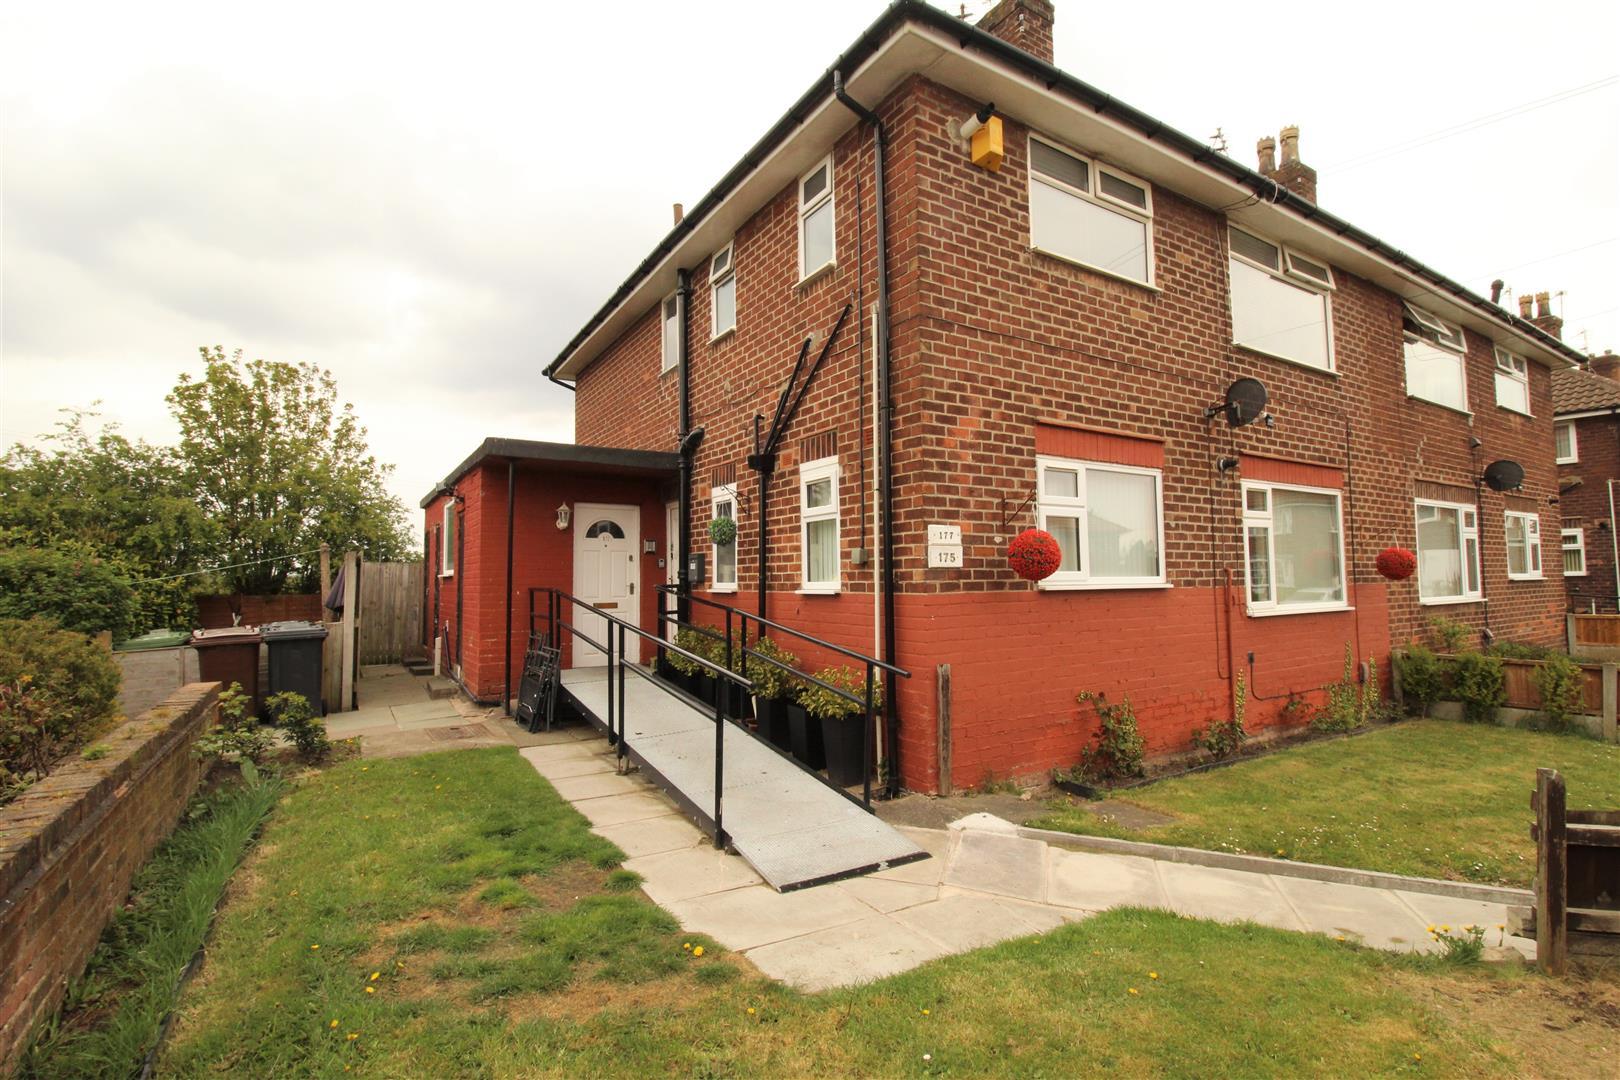 2 Bedrooms, Flat - First Floor, Oriel Close, Old Roan, Liverpool